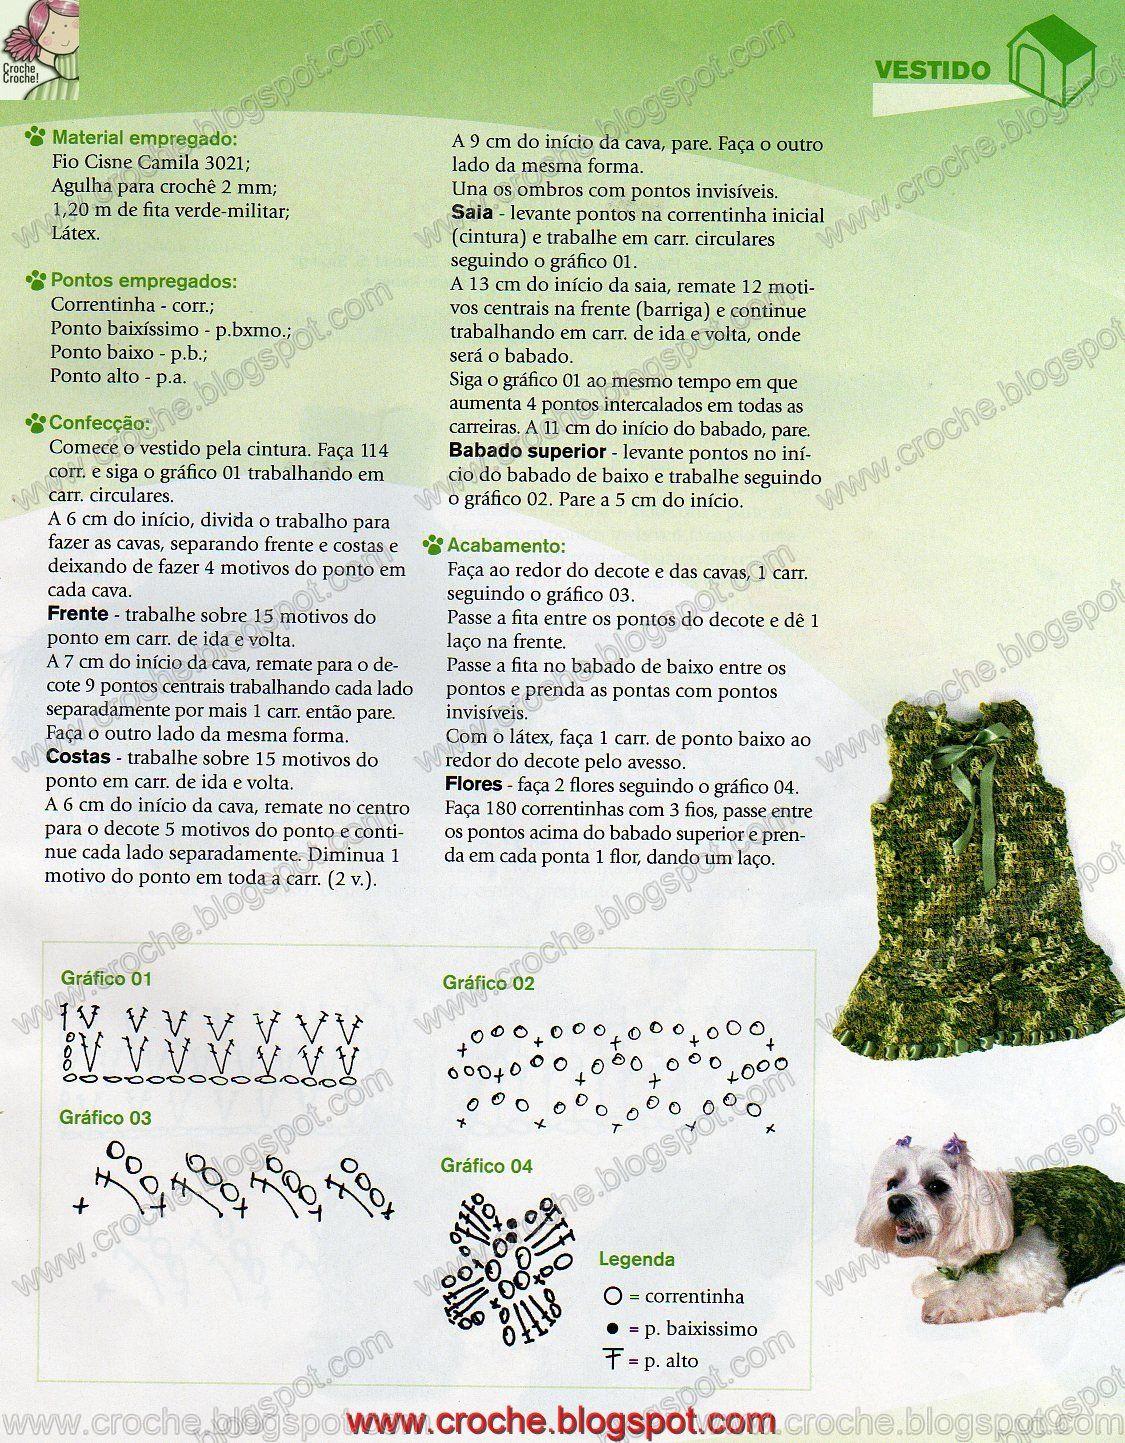 Receitas do Croche Croche!: roupa para cachorro - vestido | dla ...